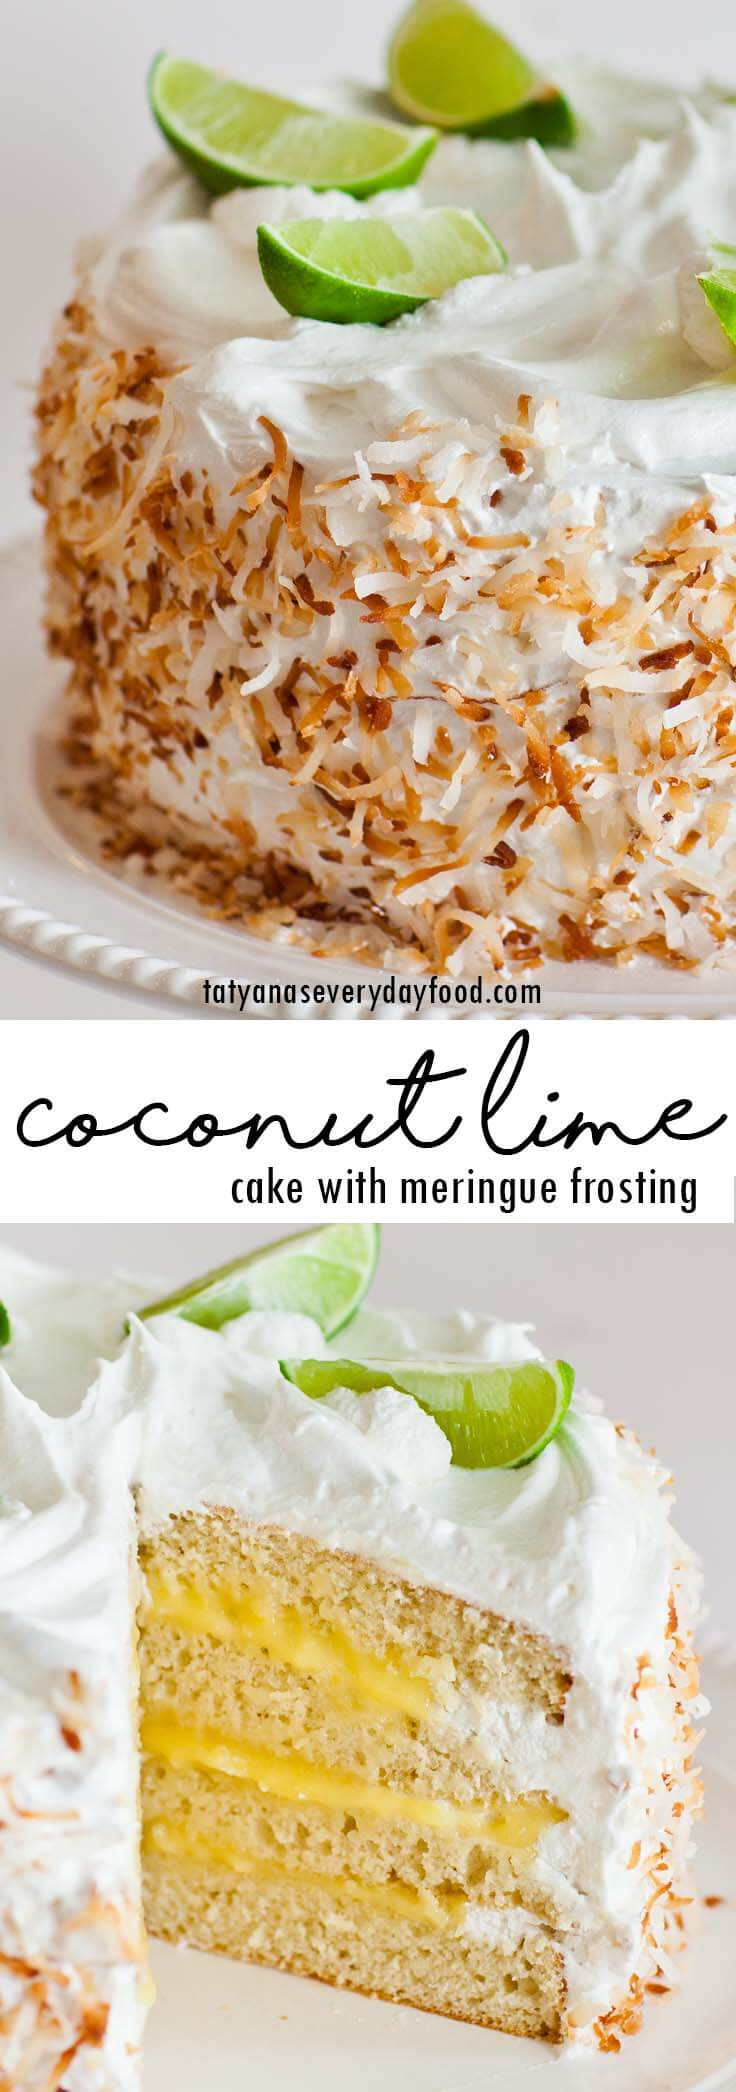 Coconut Lime Cake video recipe